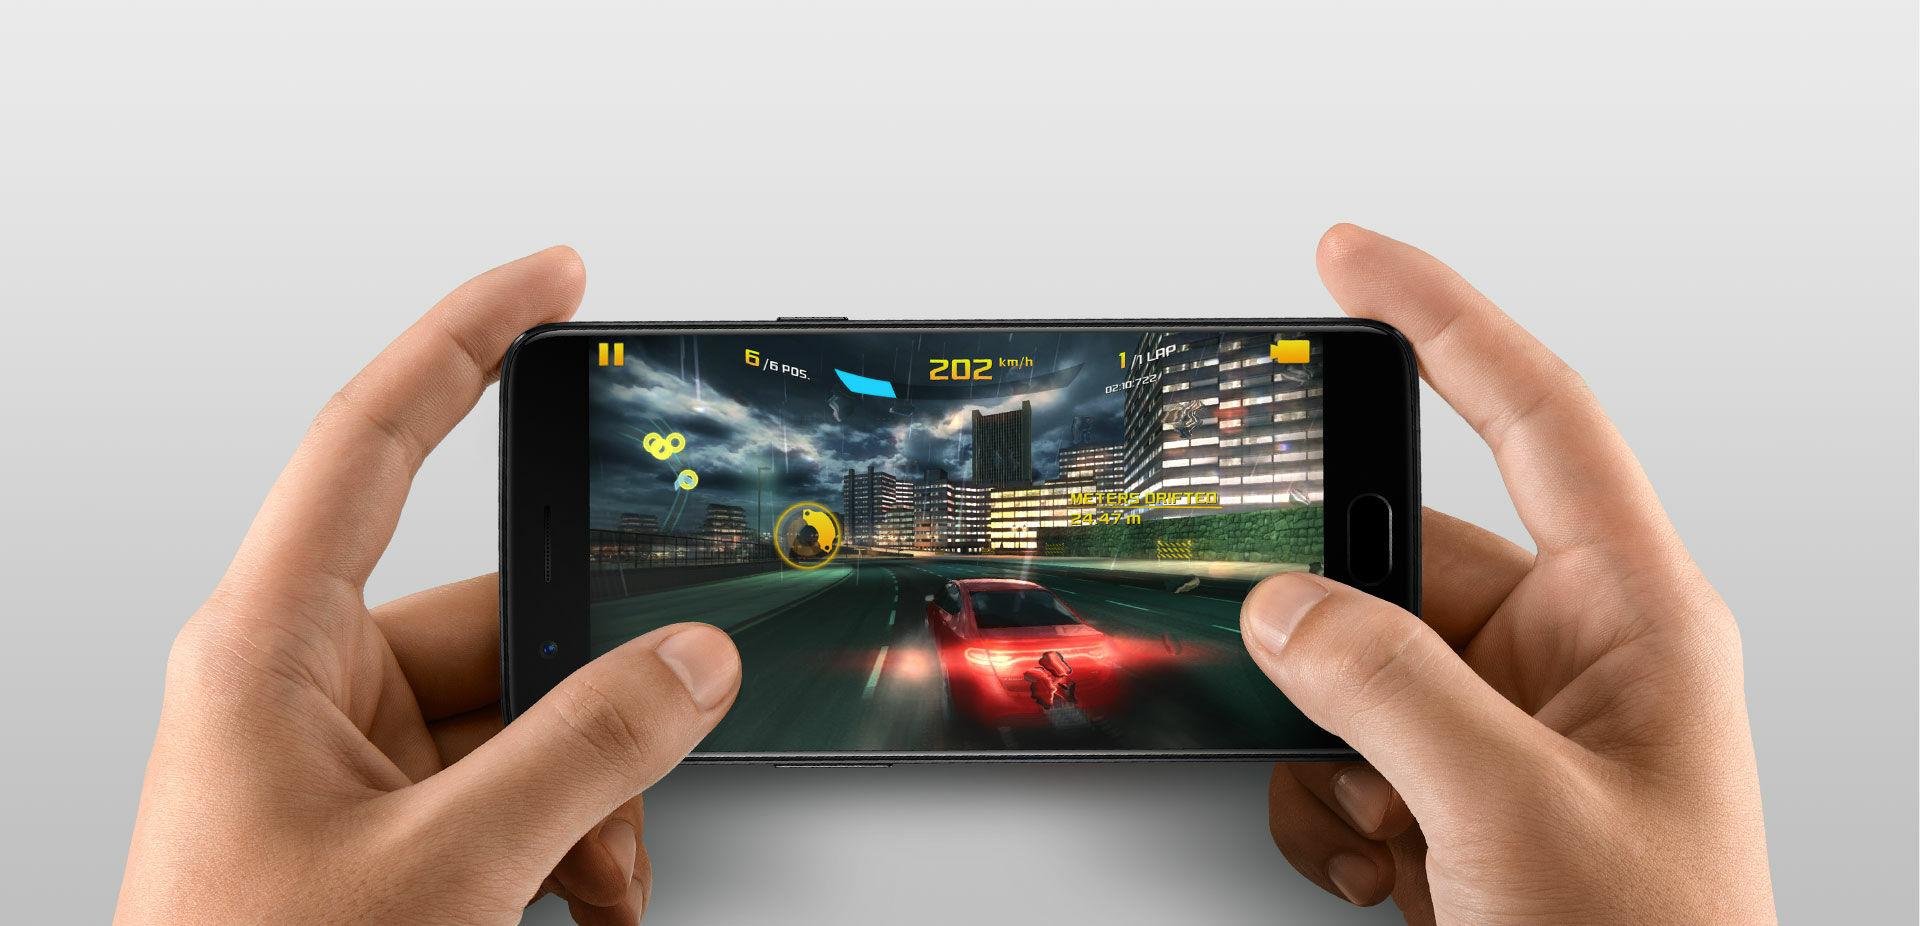 oneplus-5-smartphone-ram-8-gb